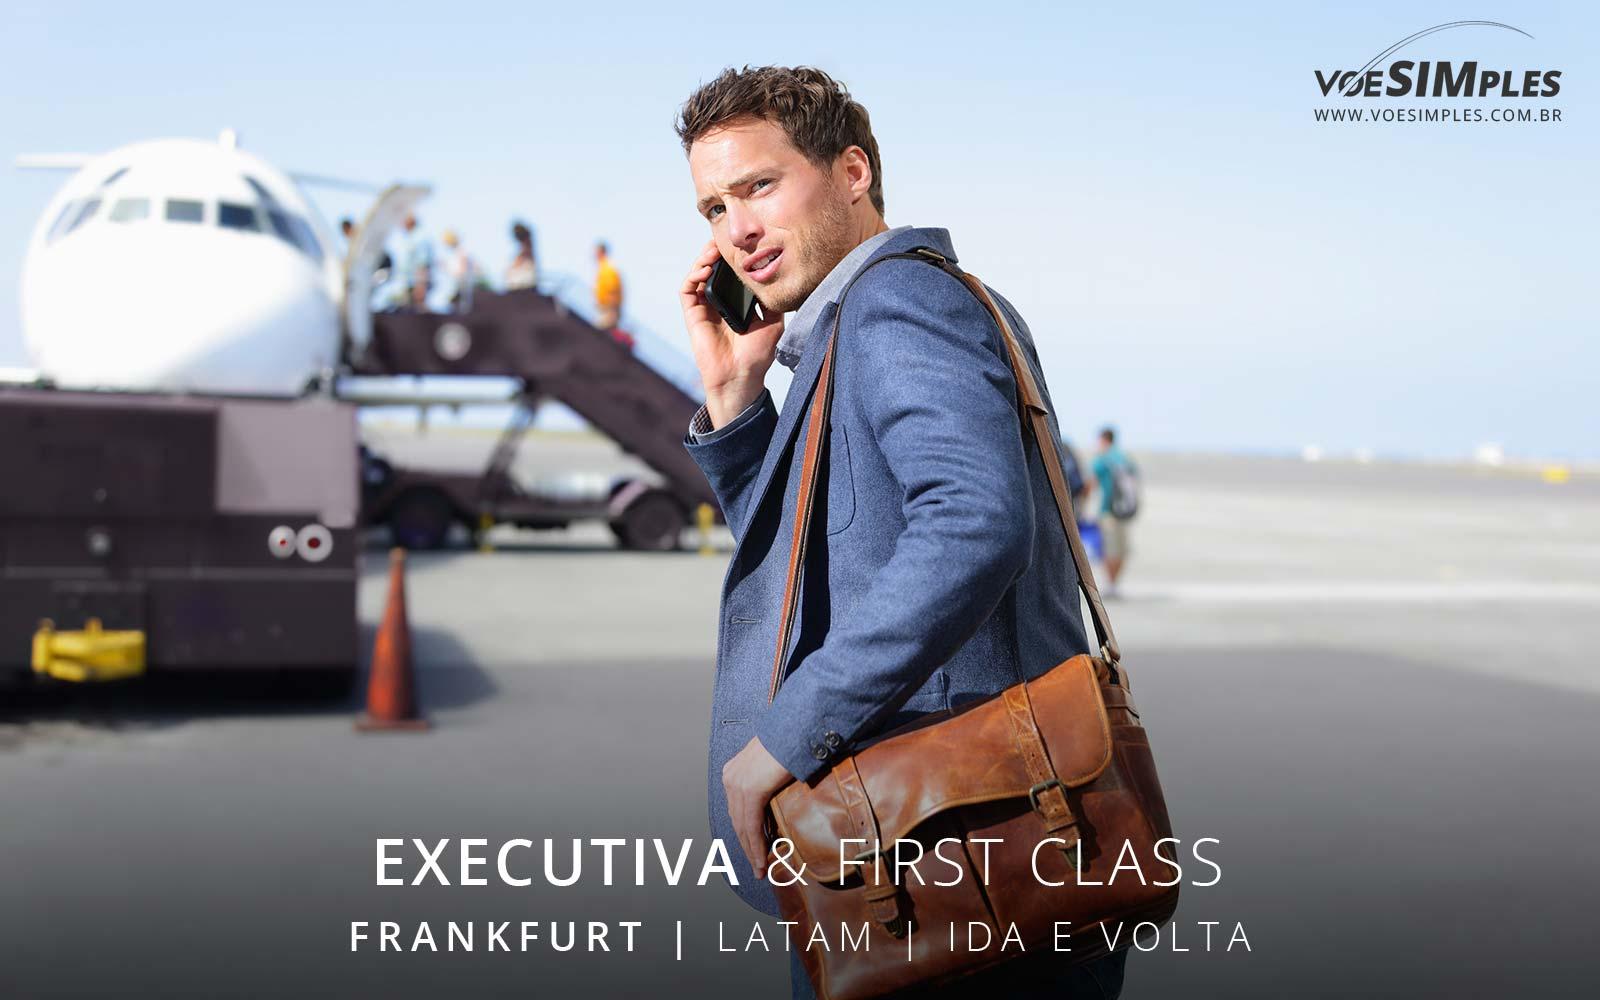 Passagem aérea Executiva Latam para Frankfurt